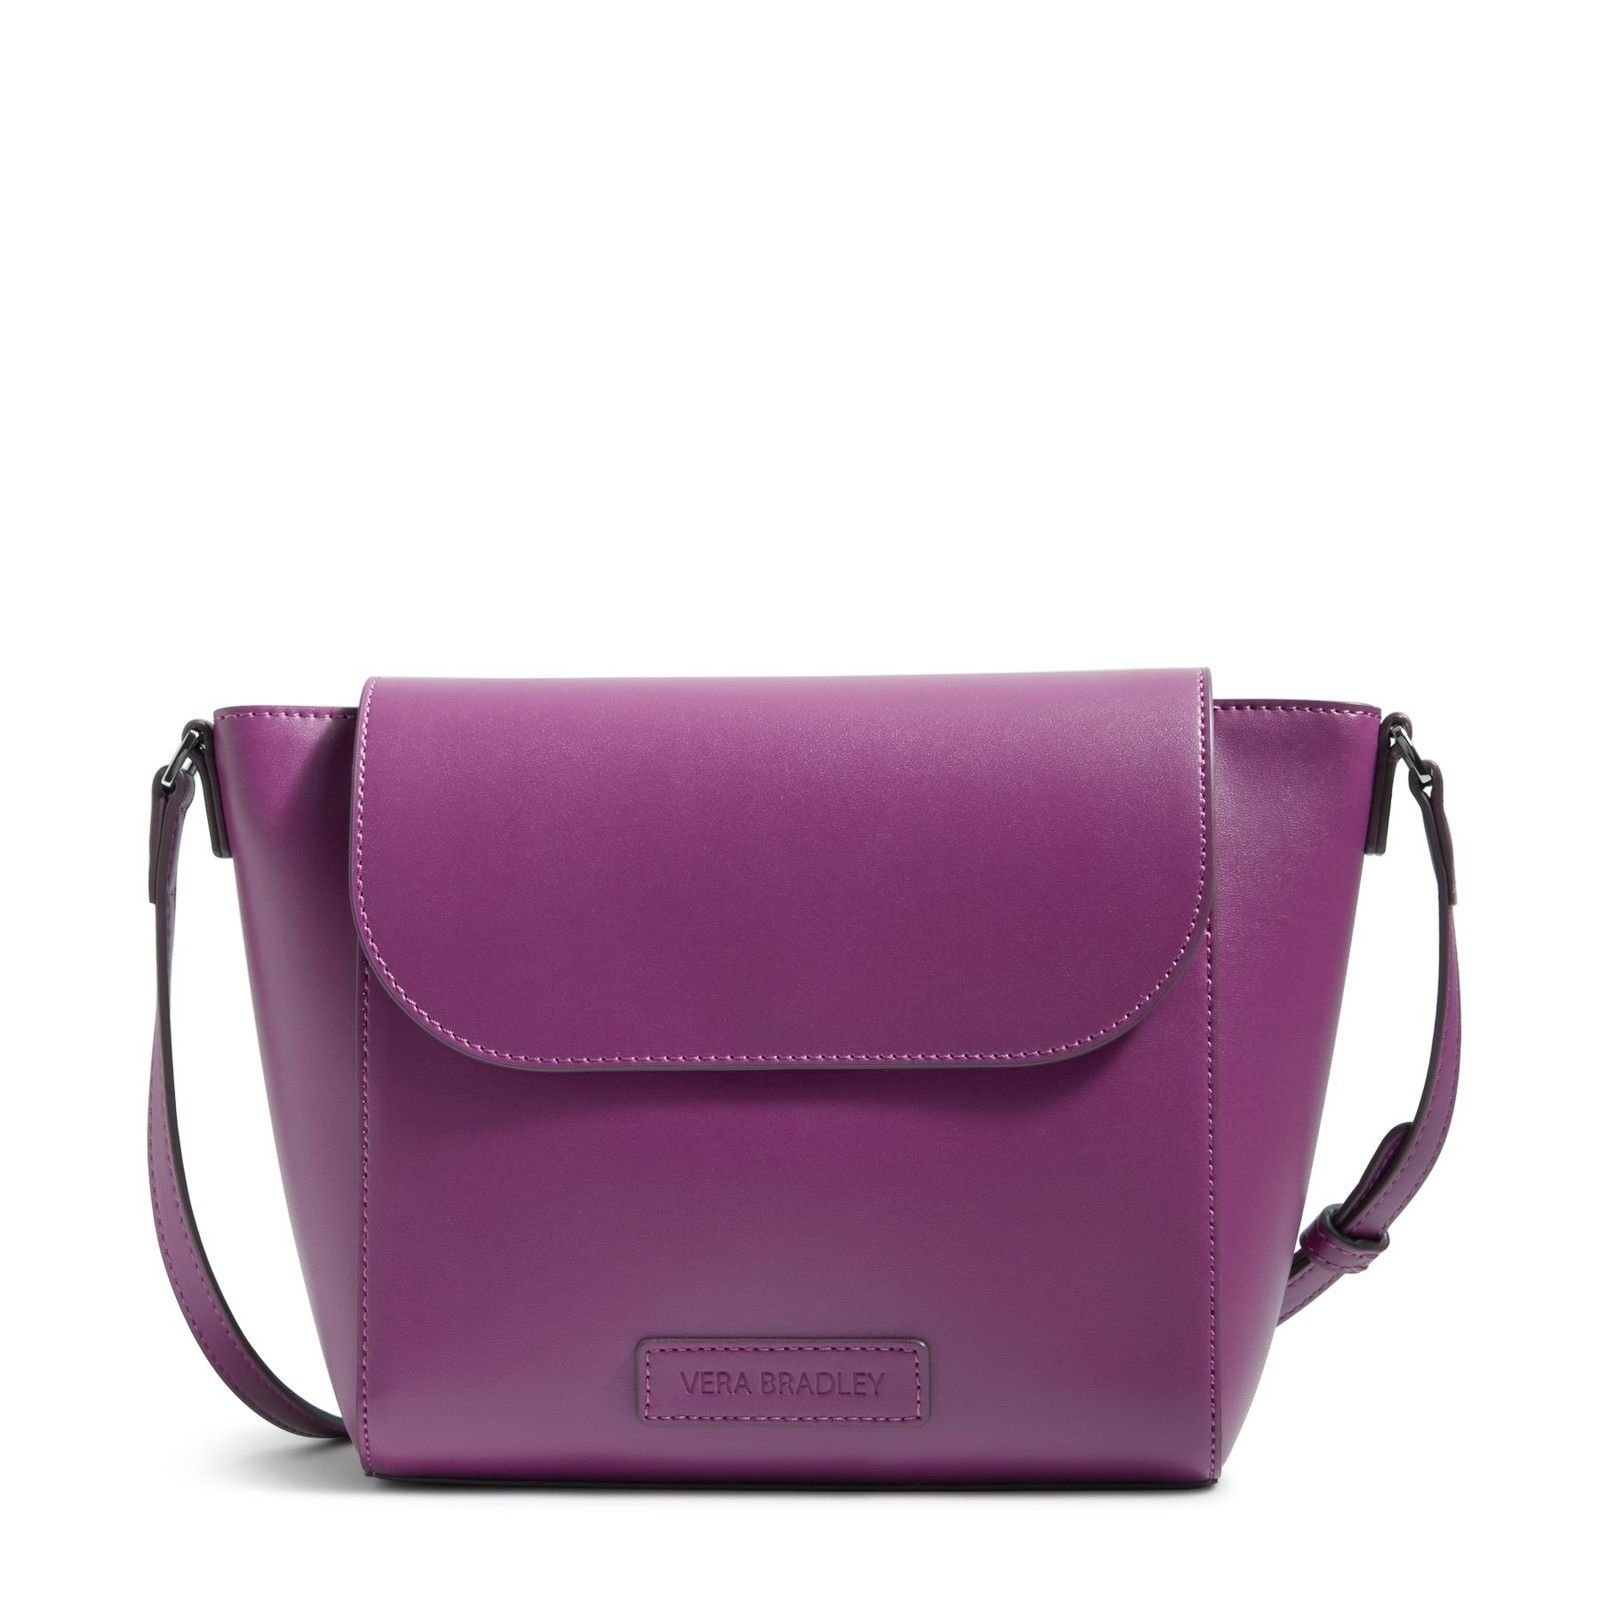 794eede813 Vera Bradley Faux Leather Flap Crossbody Bag